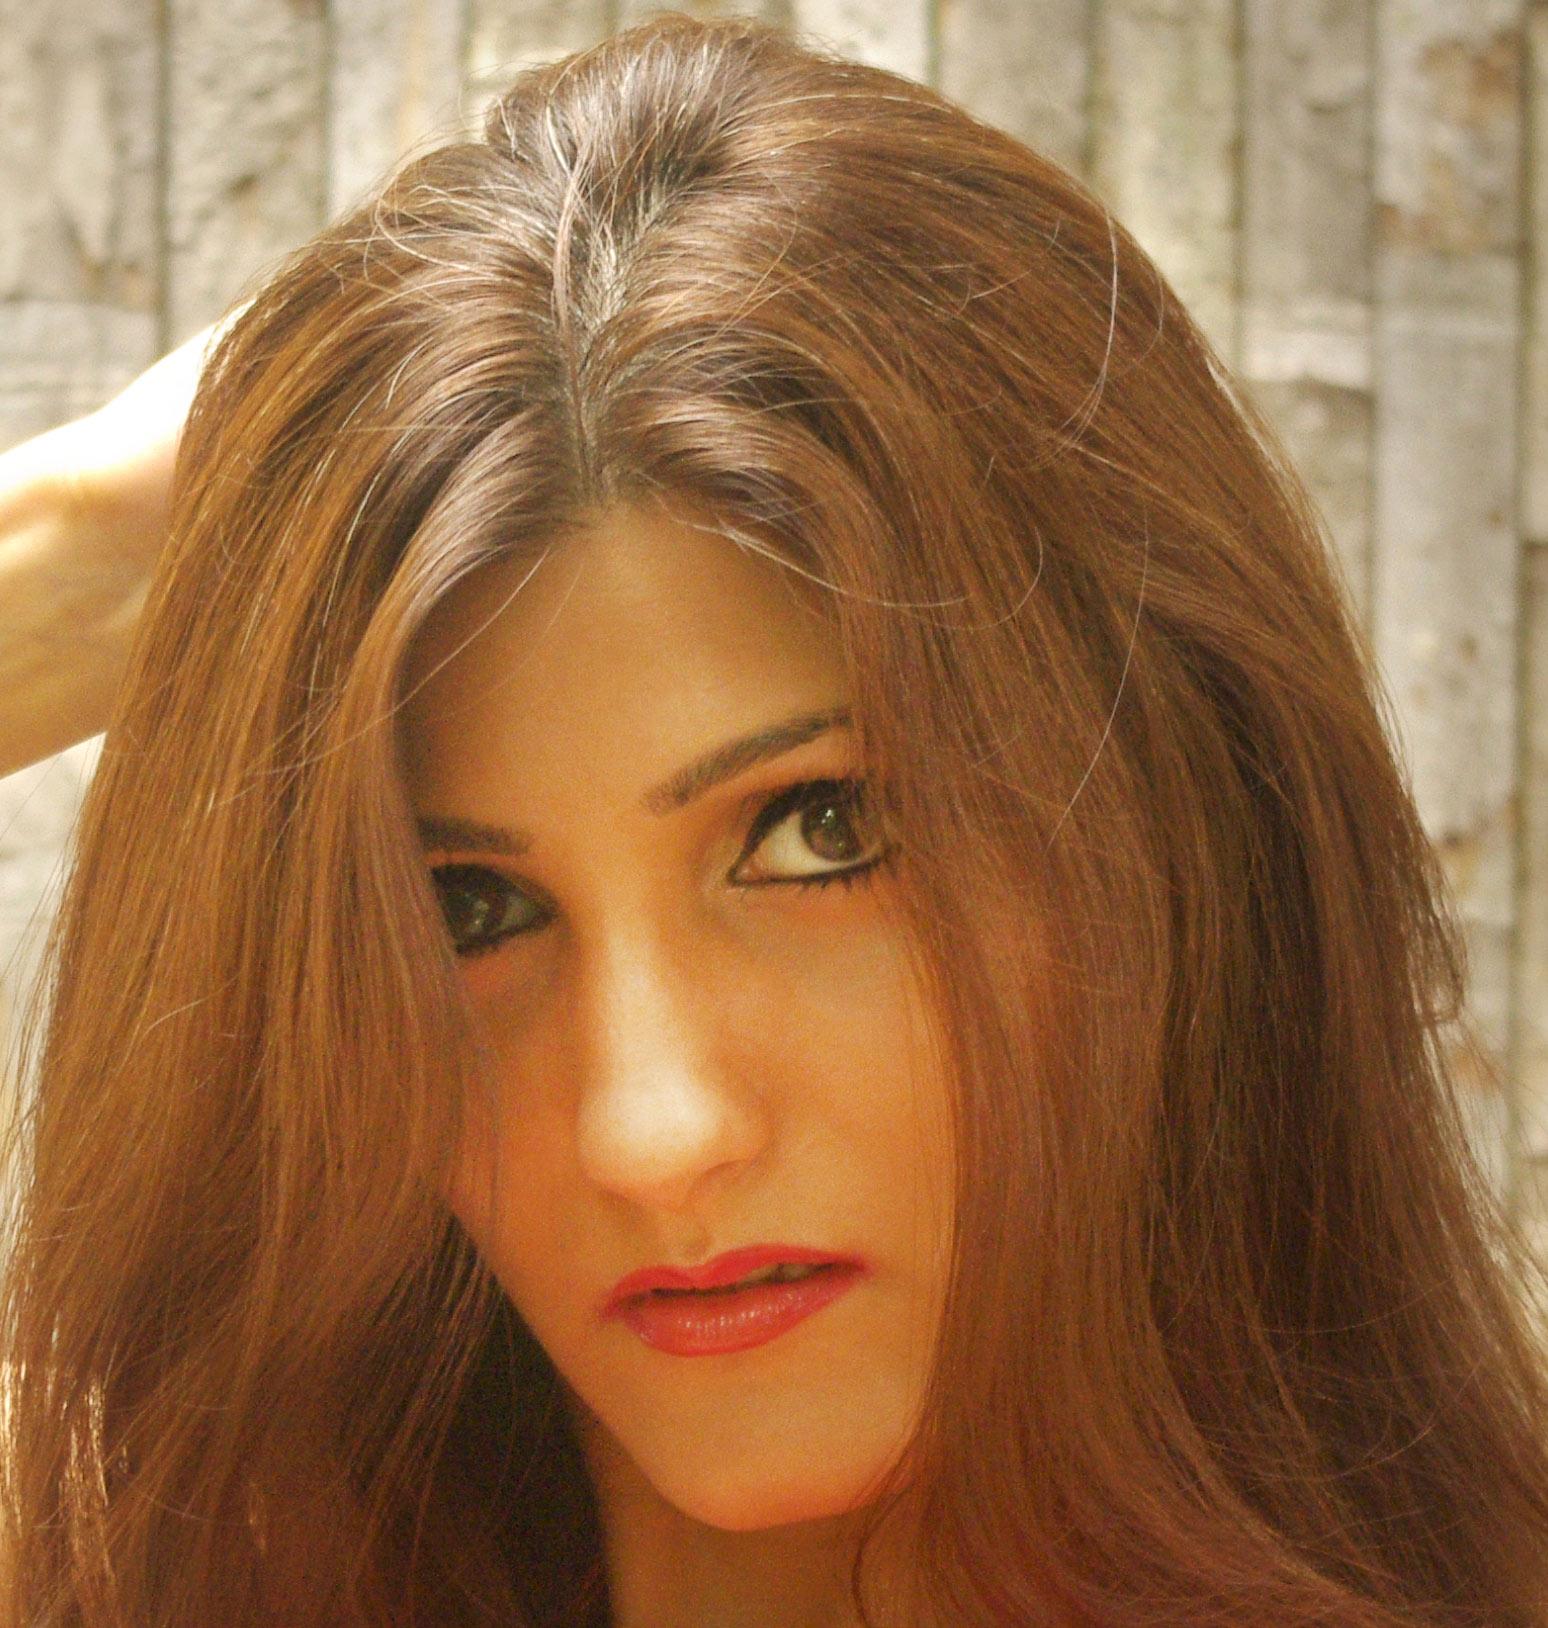 shilpa-ahuja-indian-fashion-blogger-sexy-hot-pose-model-style